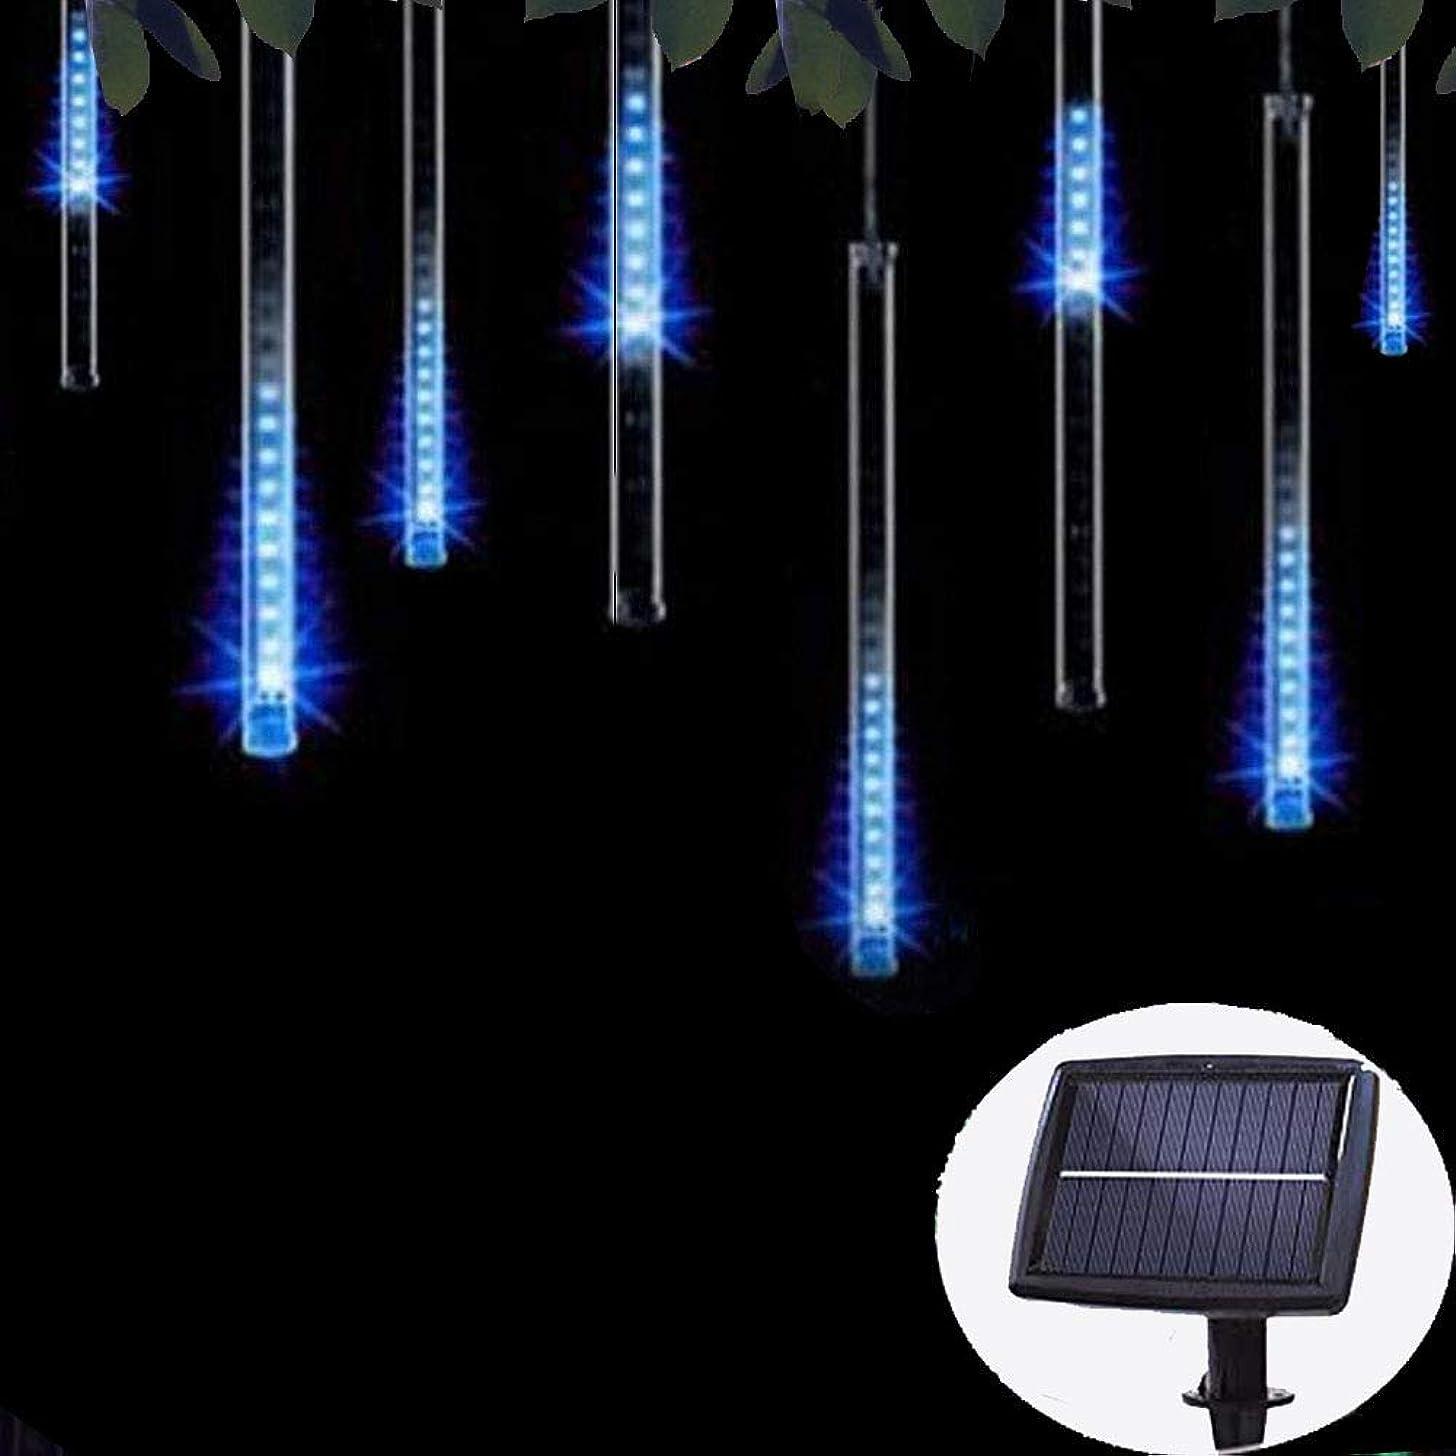 Solar Lights Tree Outdoor 10 Tubes Waterproof Meteor Shower Rain Lights Falling Rain Drop Christmas Light Cascading String Lights for Holiday Party Wedding Xmas Decoration (Blue)